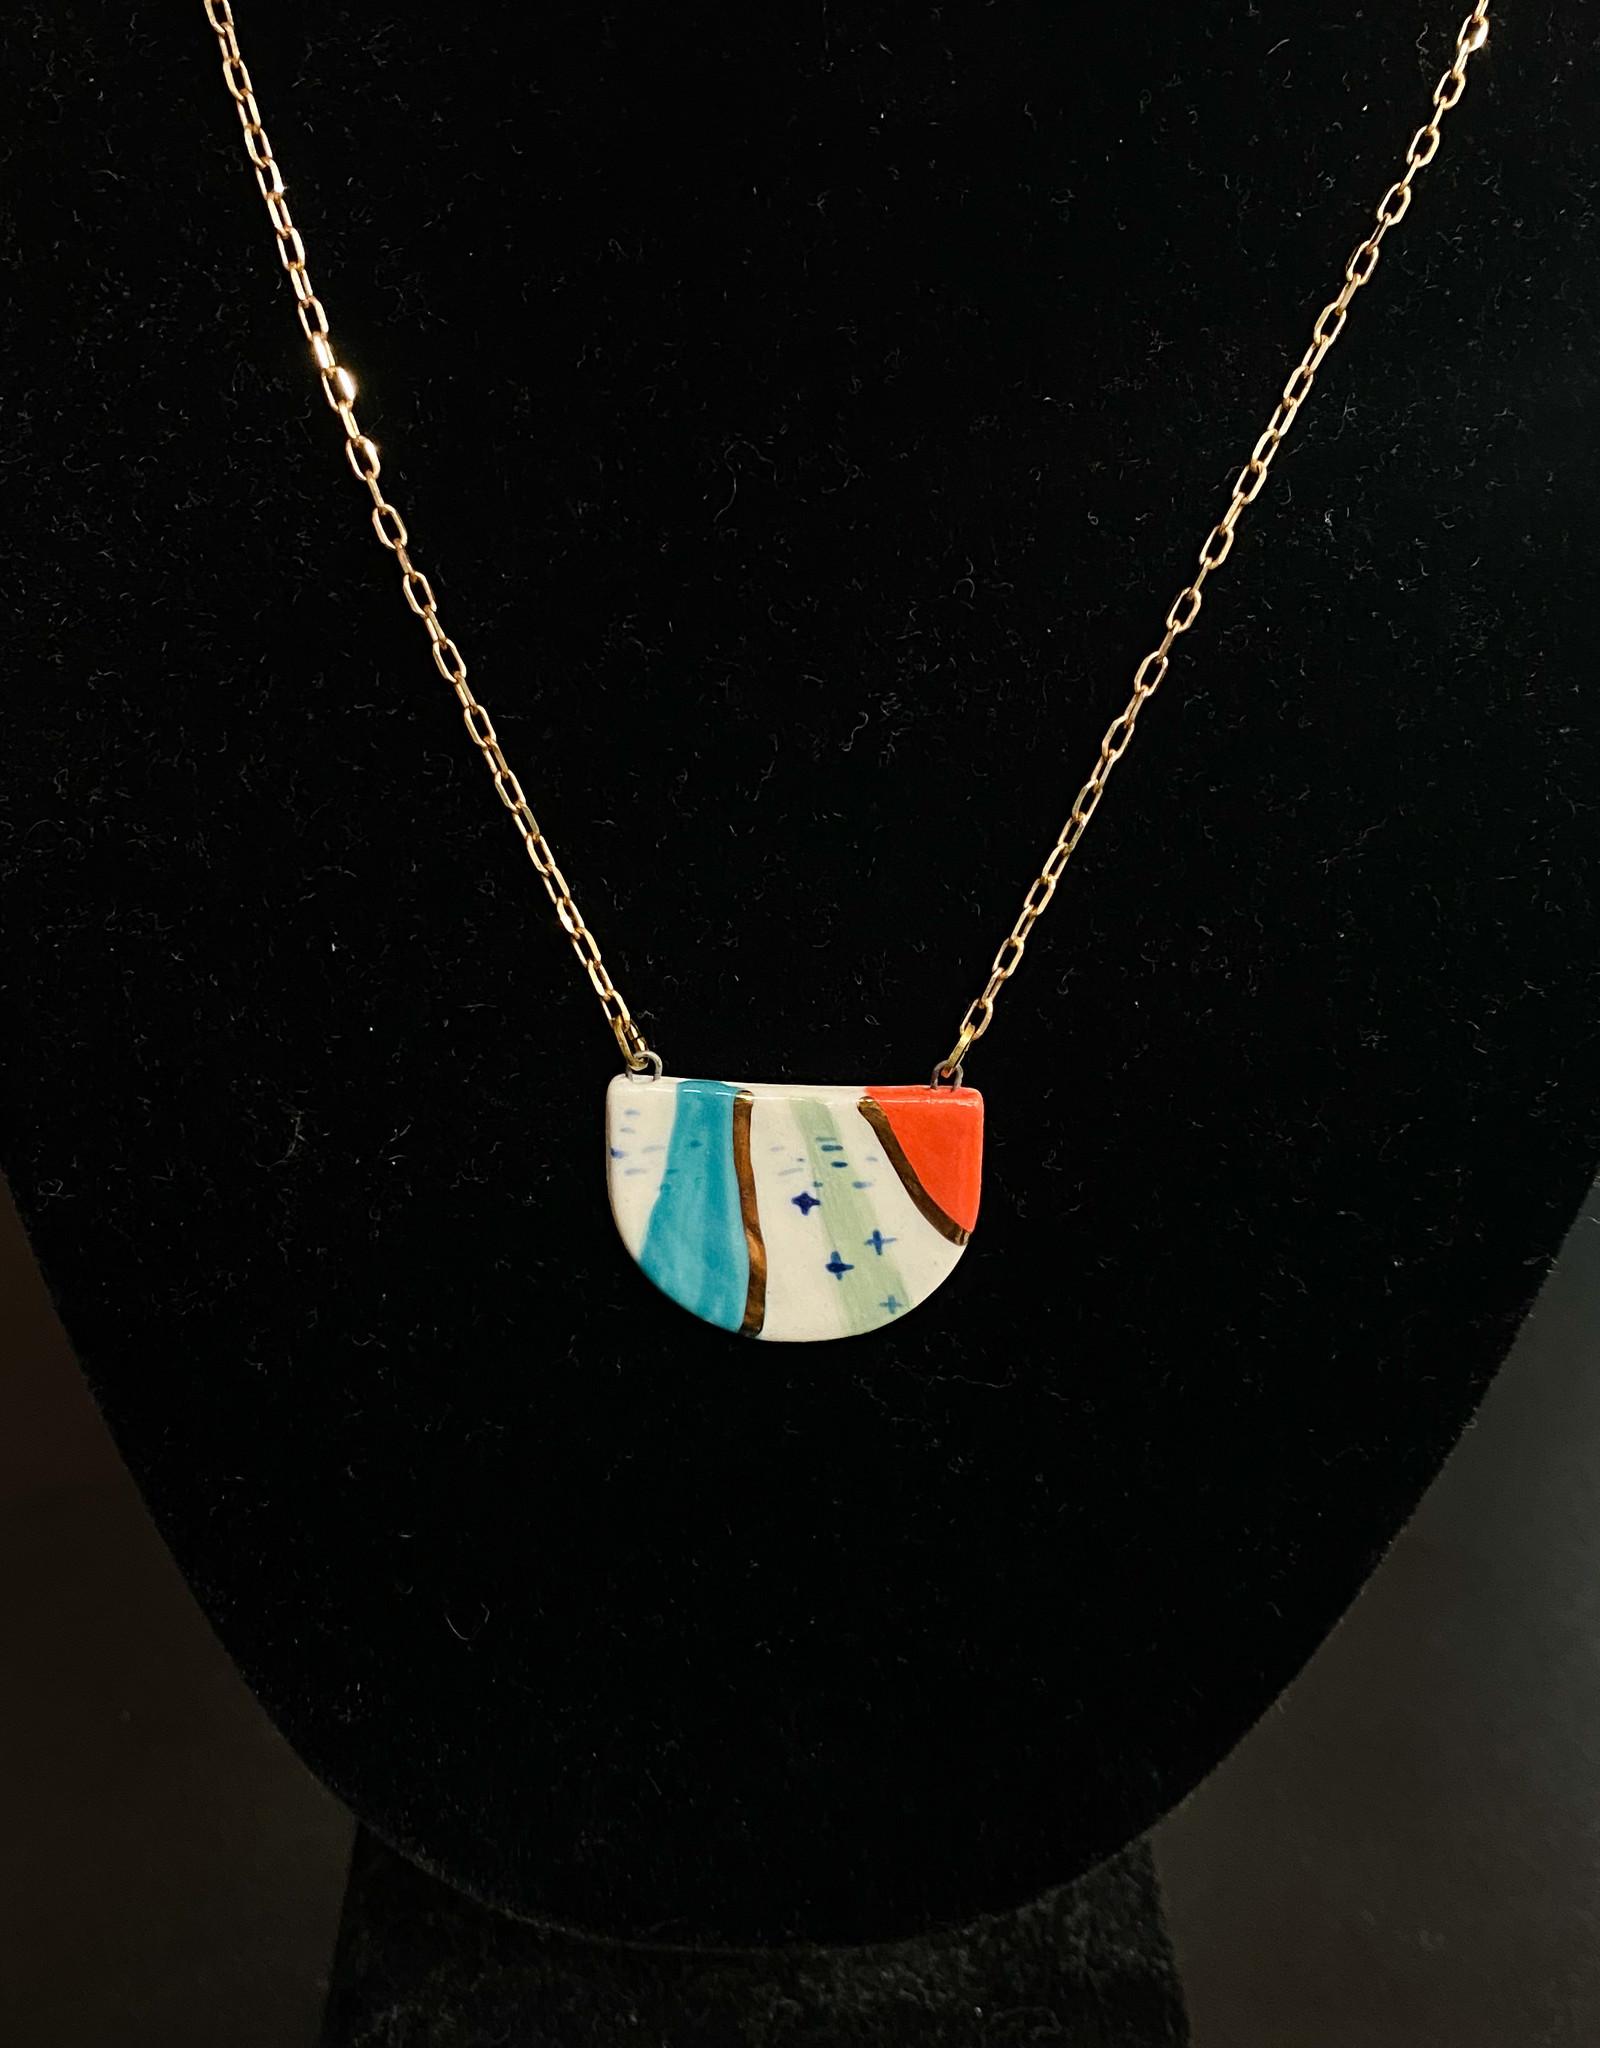 Colorful Pendant Necklace